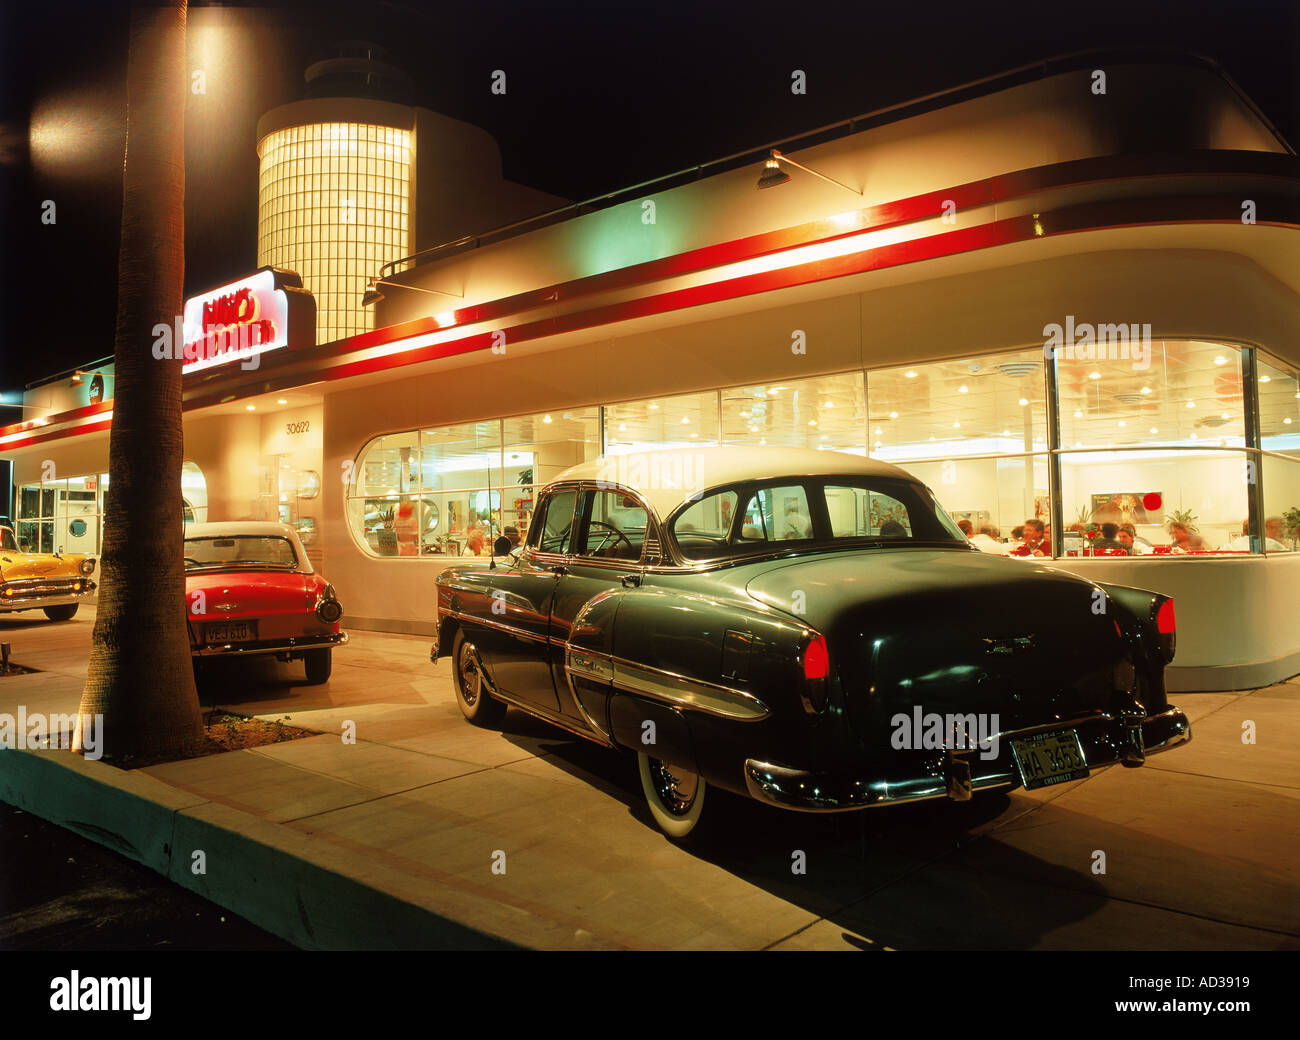 Classic American Car Diner Stock Photos Amp Classic American